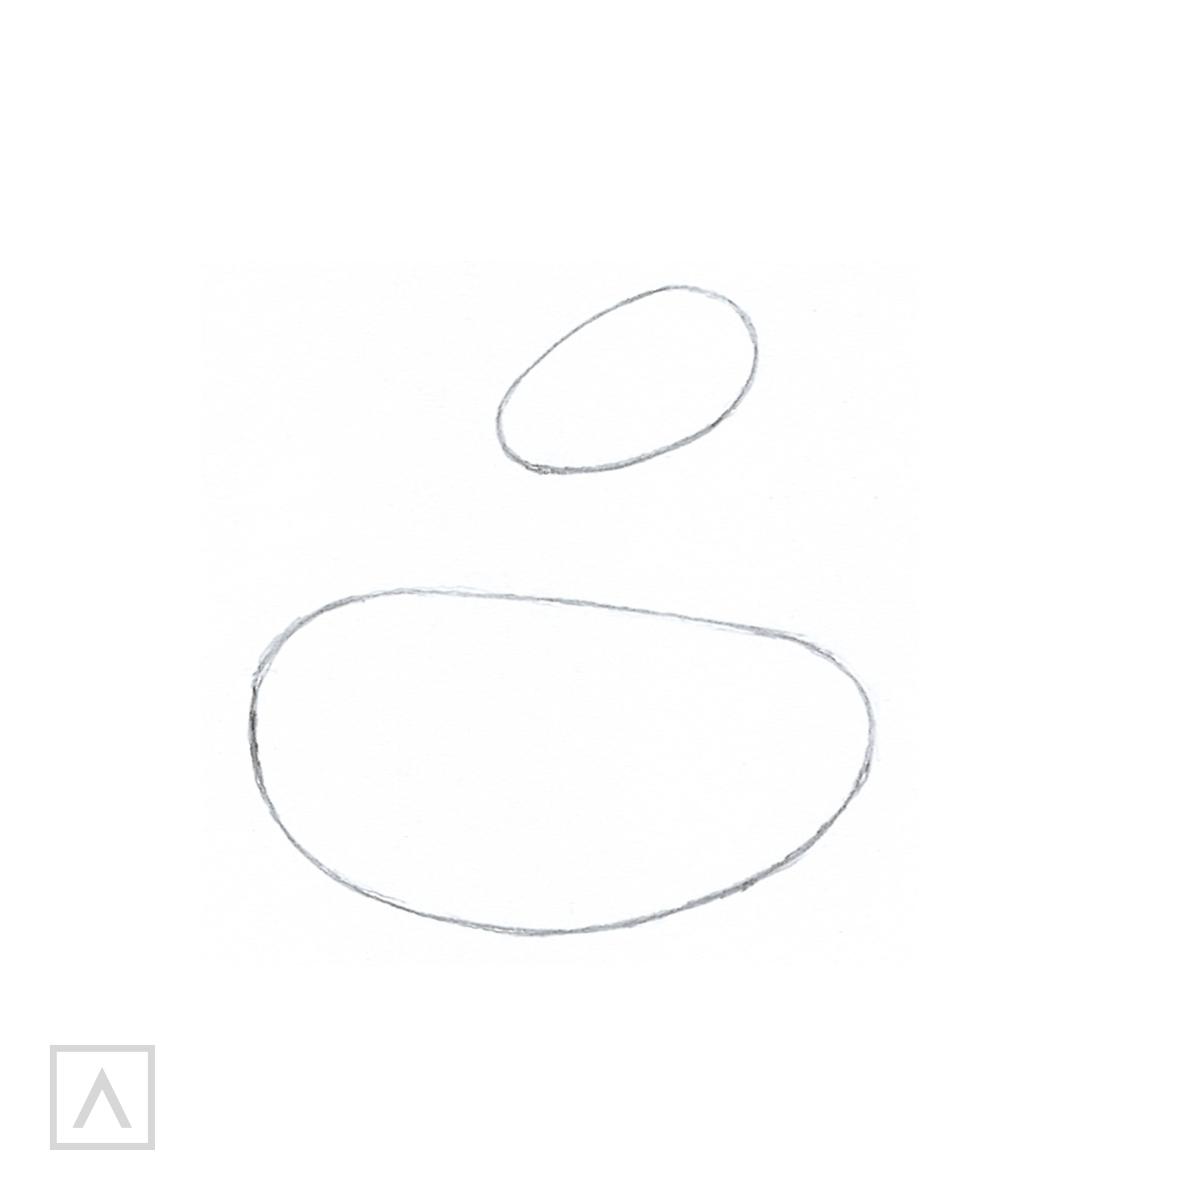 How to Draw a Unicorn - Step 1